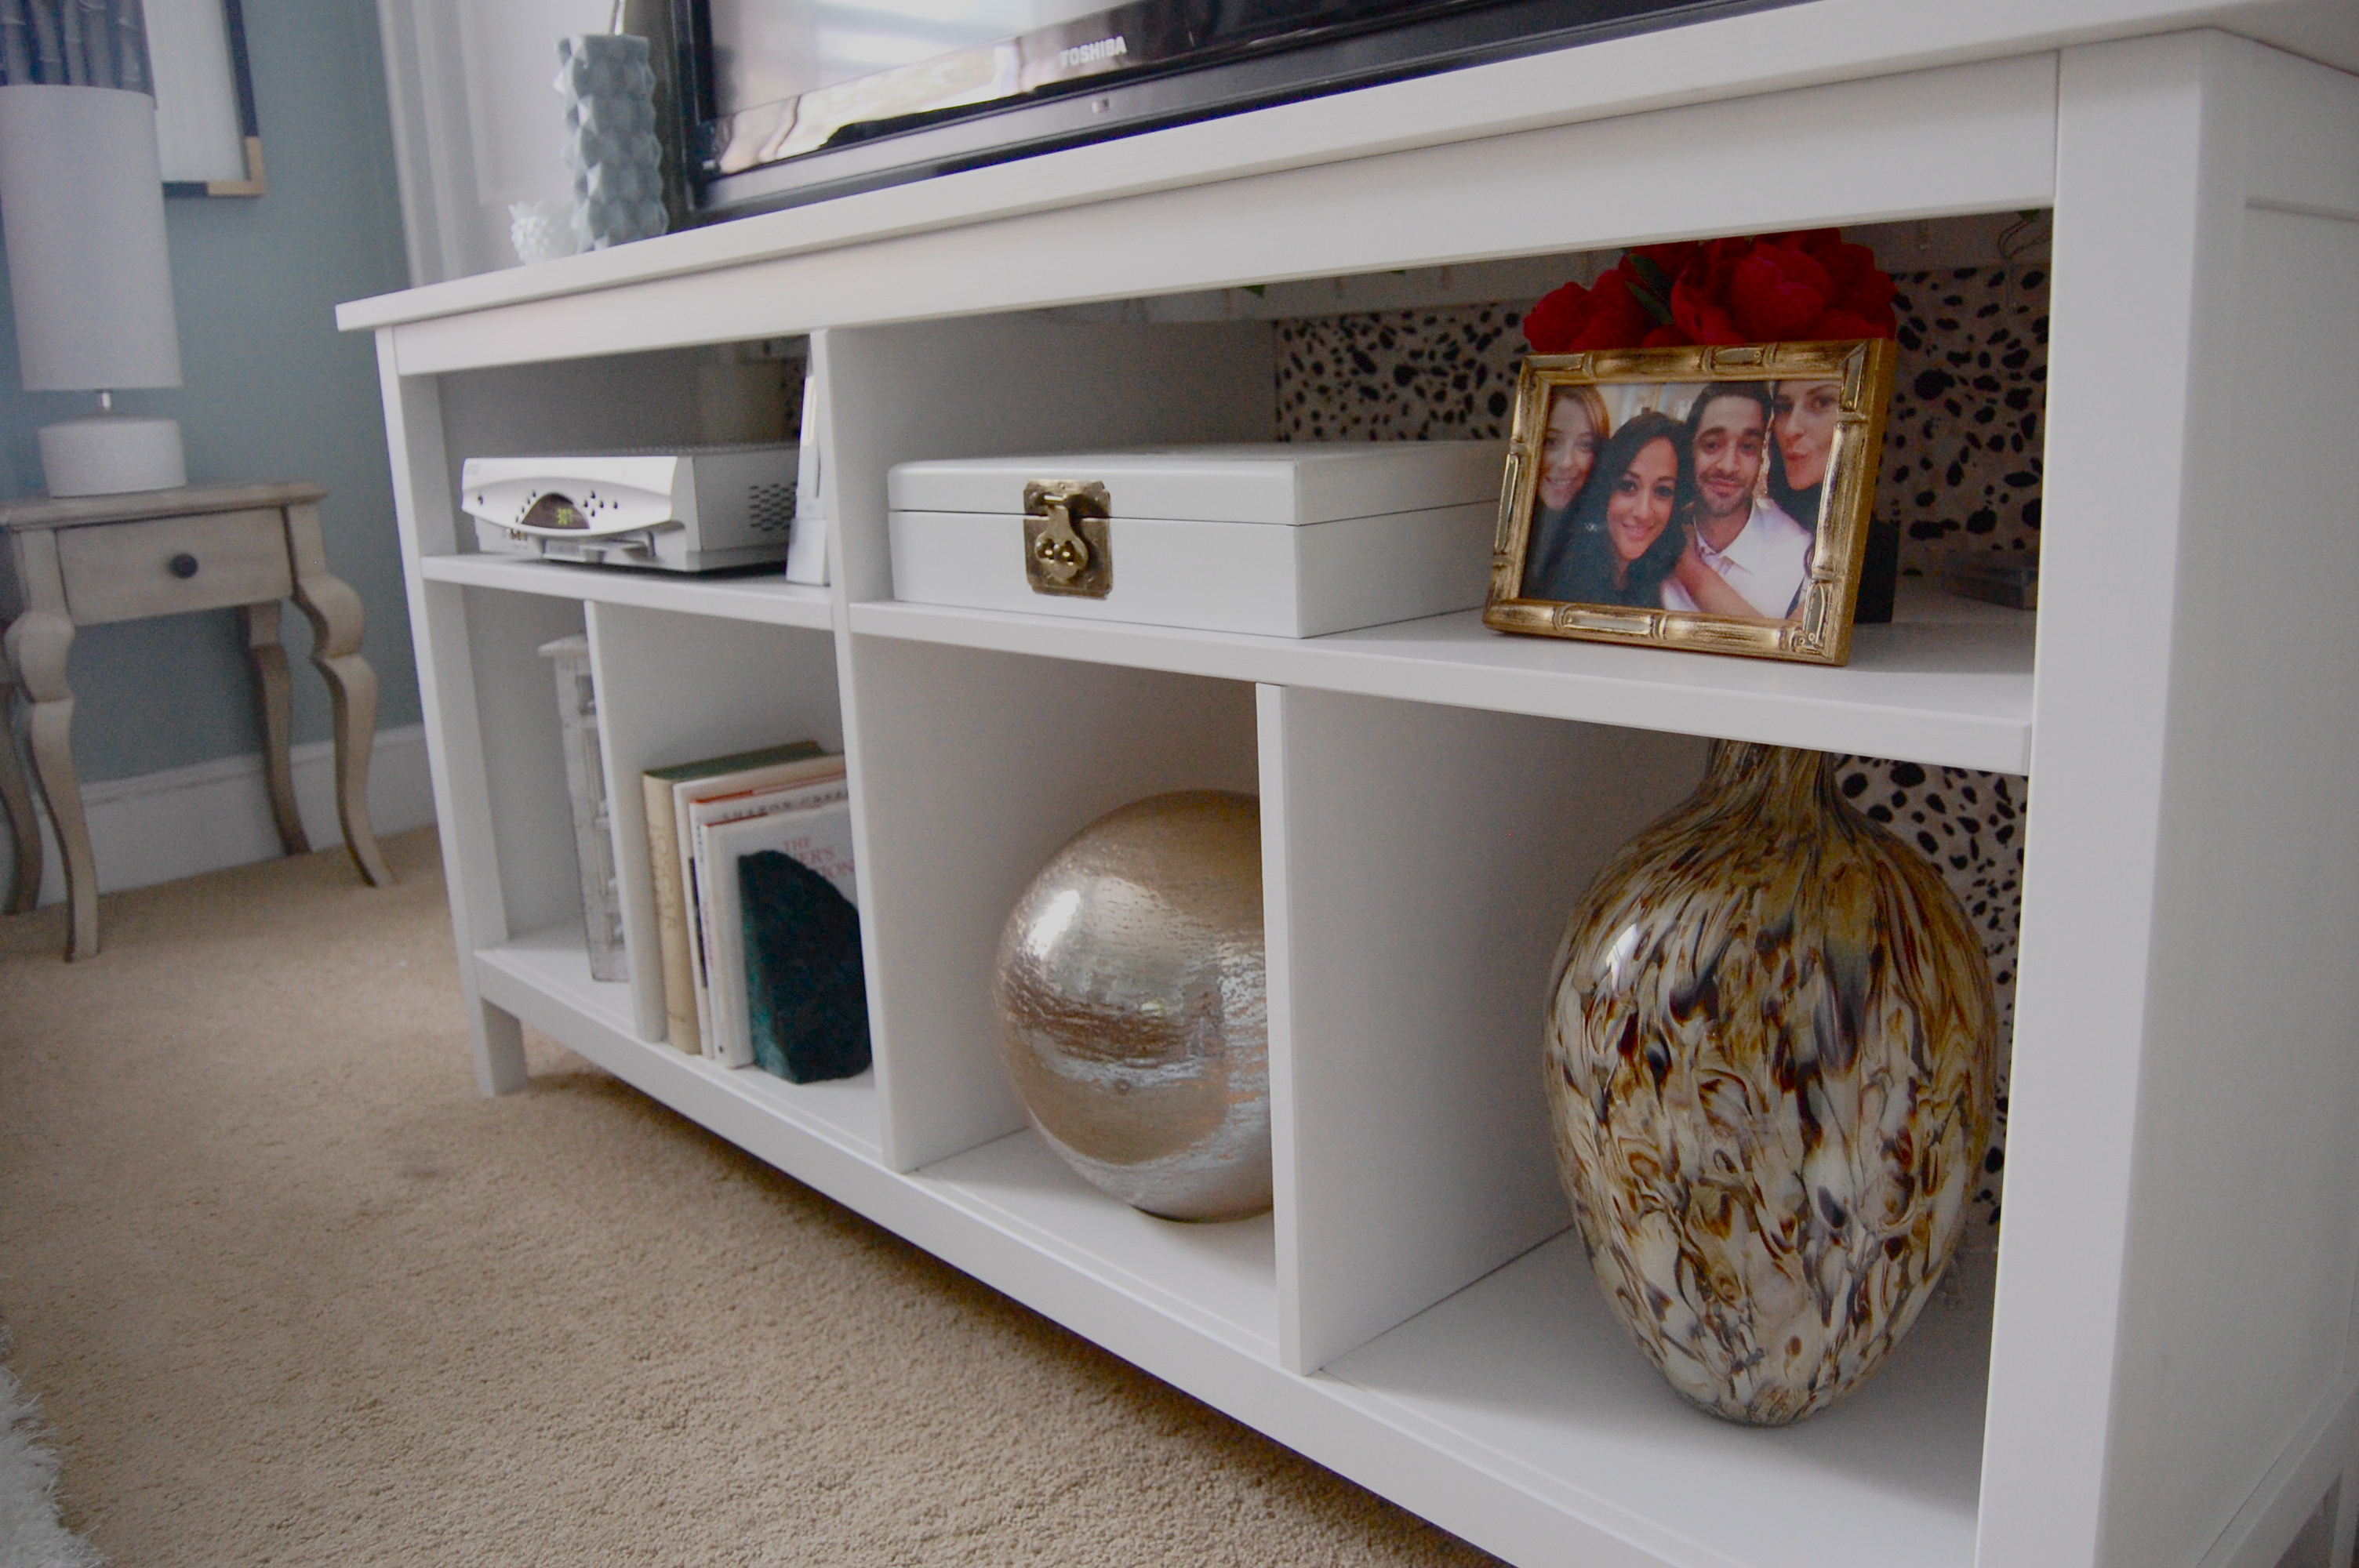 Ikea Hemnes Living Room Furniture Review Home Design Ideas # Meuble Ikea Tv Case